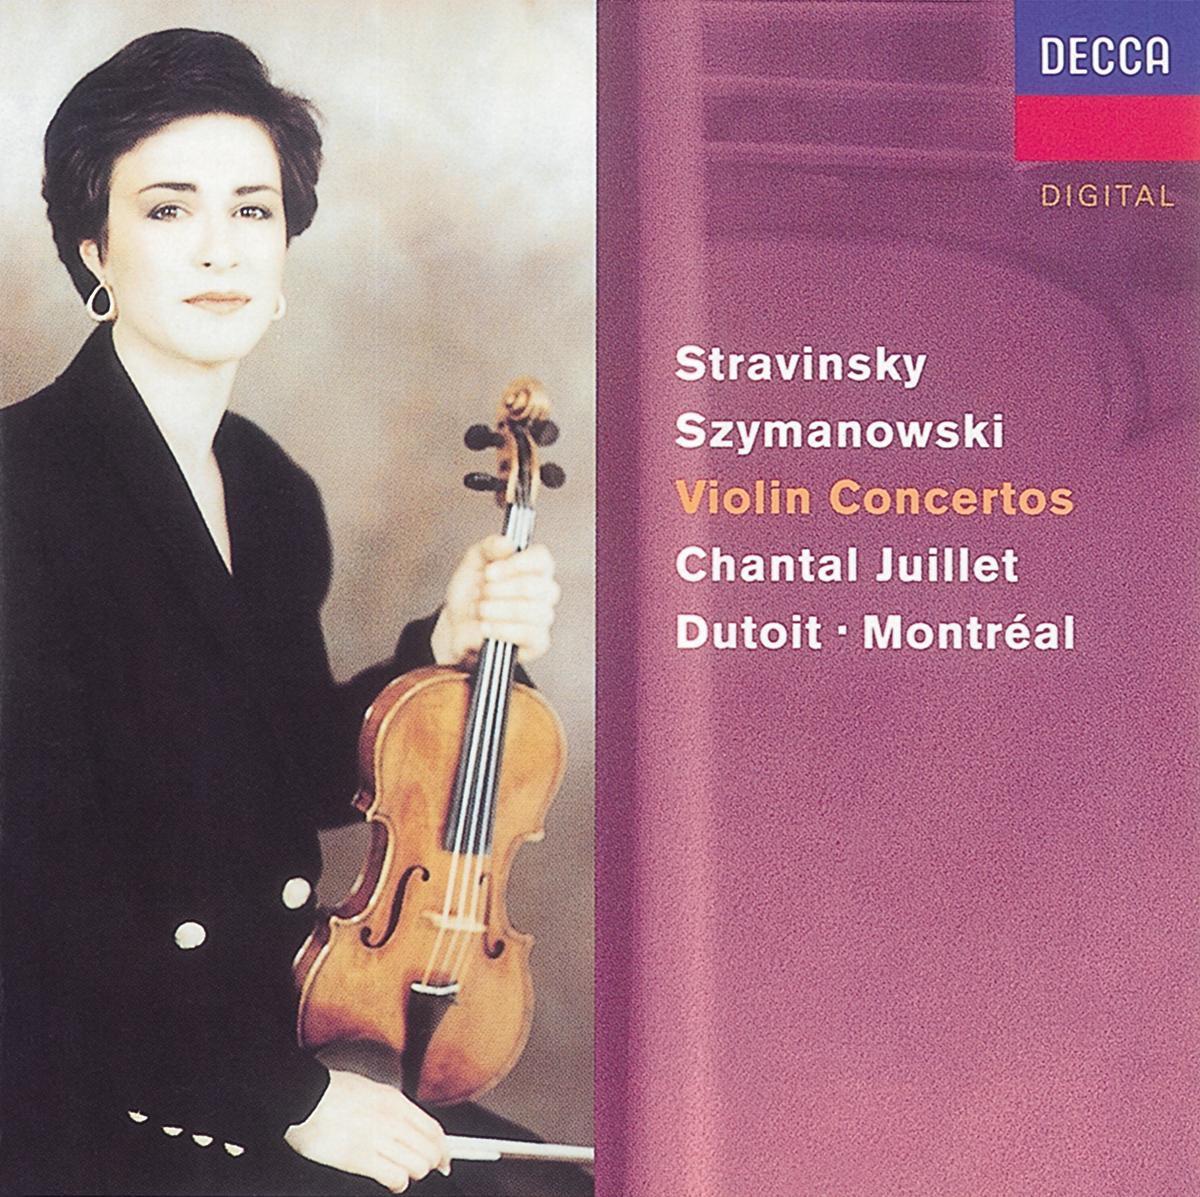 Stravinsky: Violin Concerto - Szymanowski: Violin Concertos Nos. 1 & 2